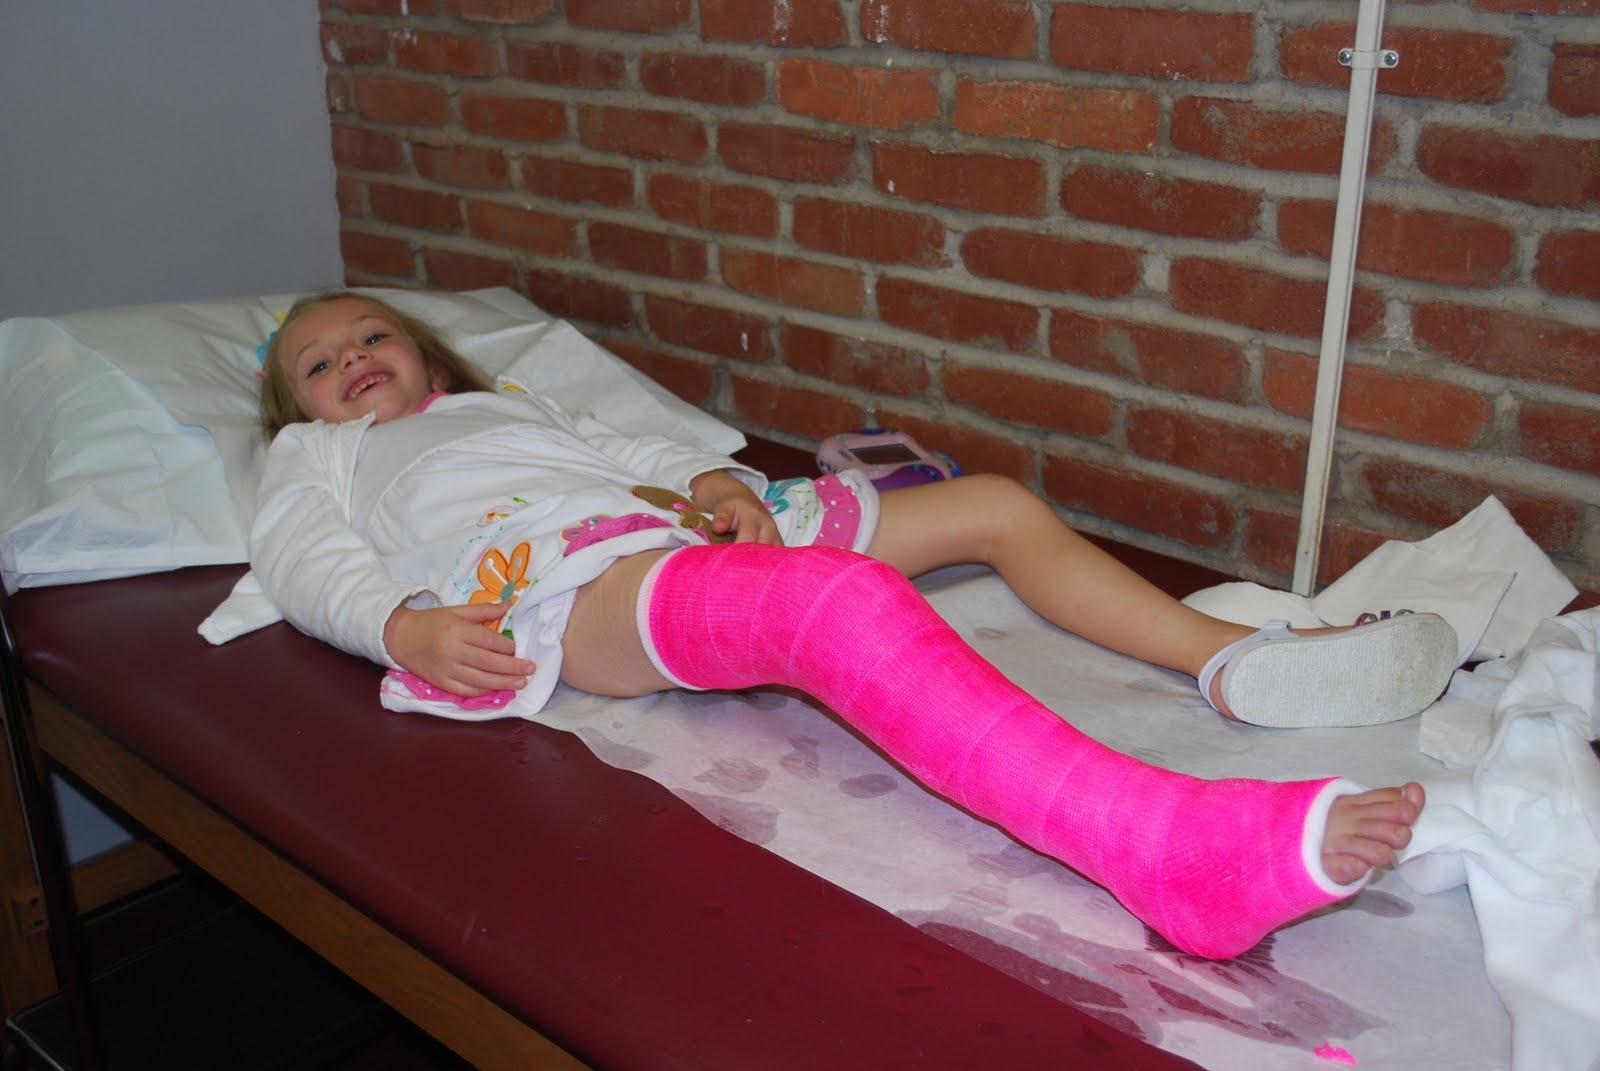 Her Broken Leg Cast